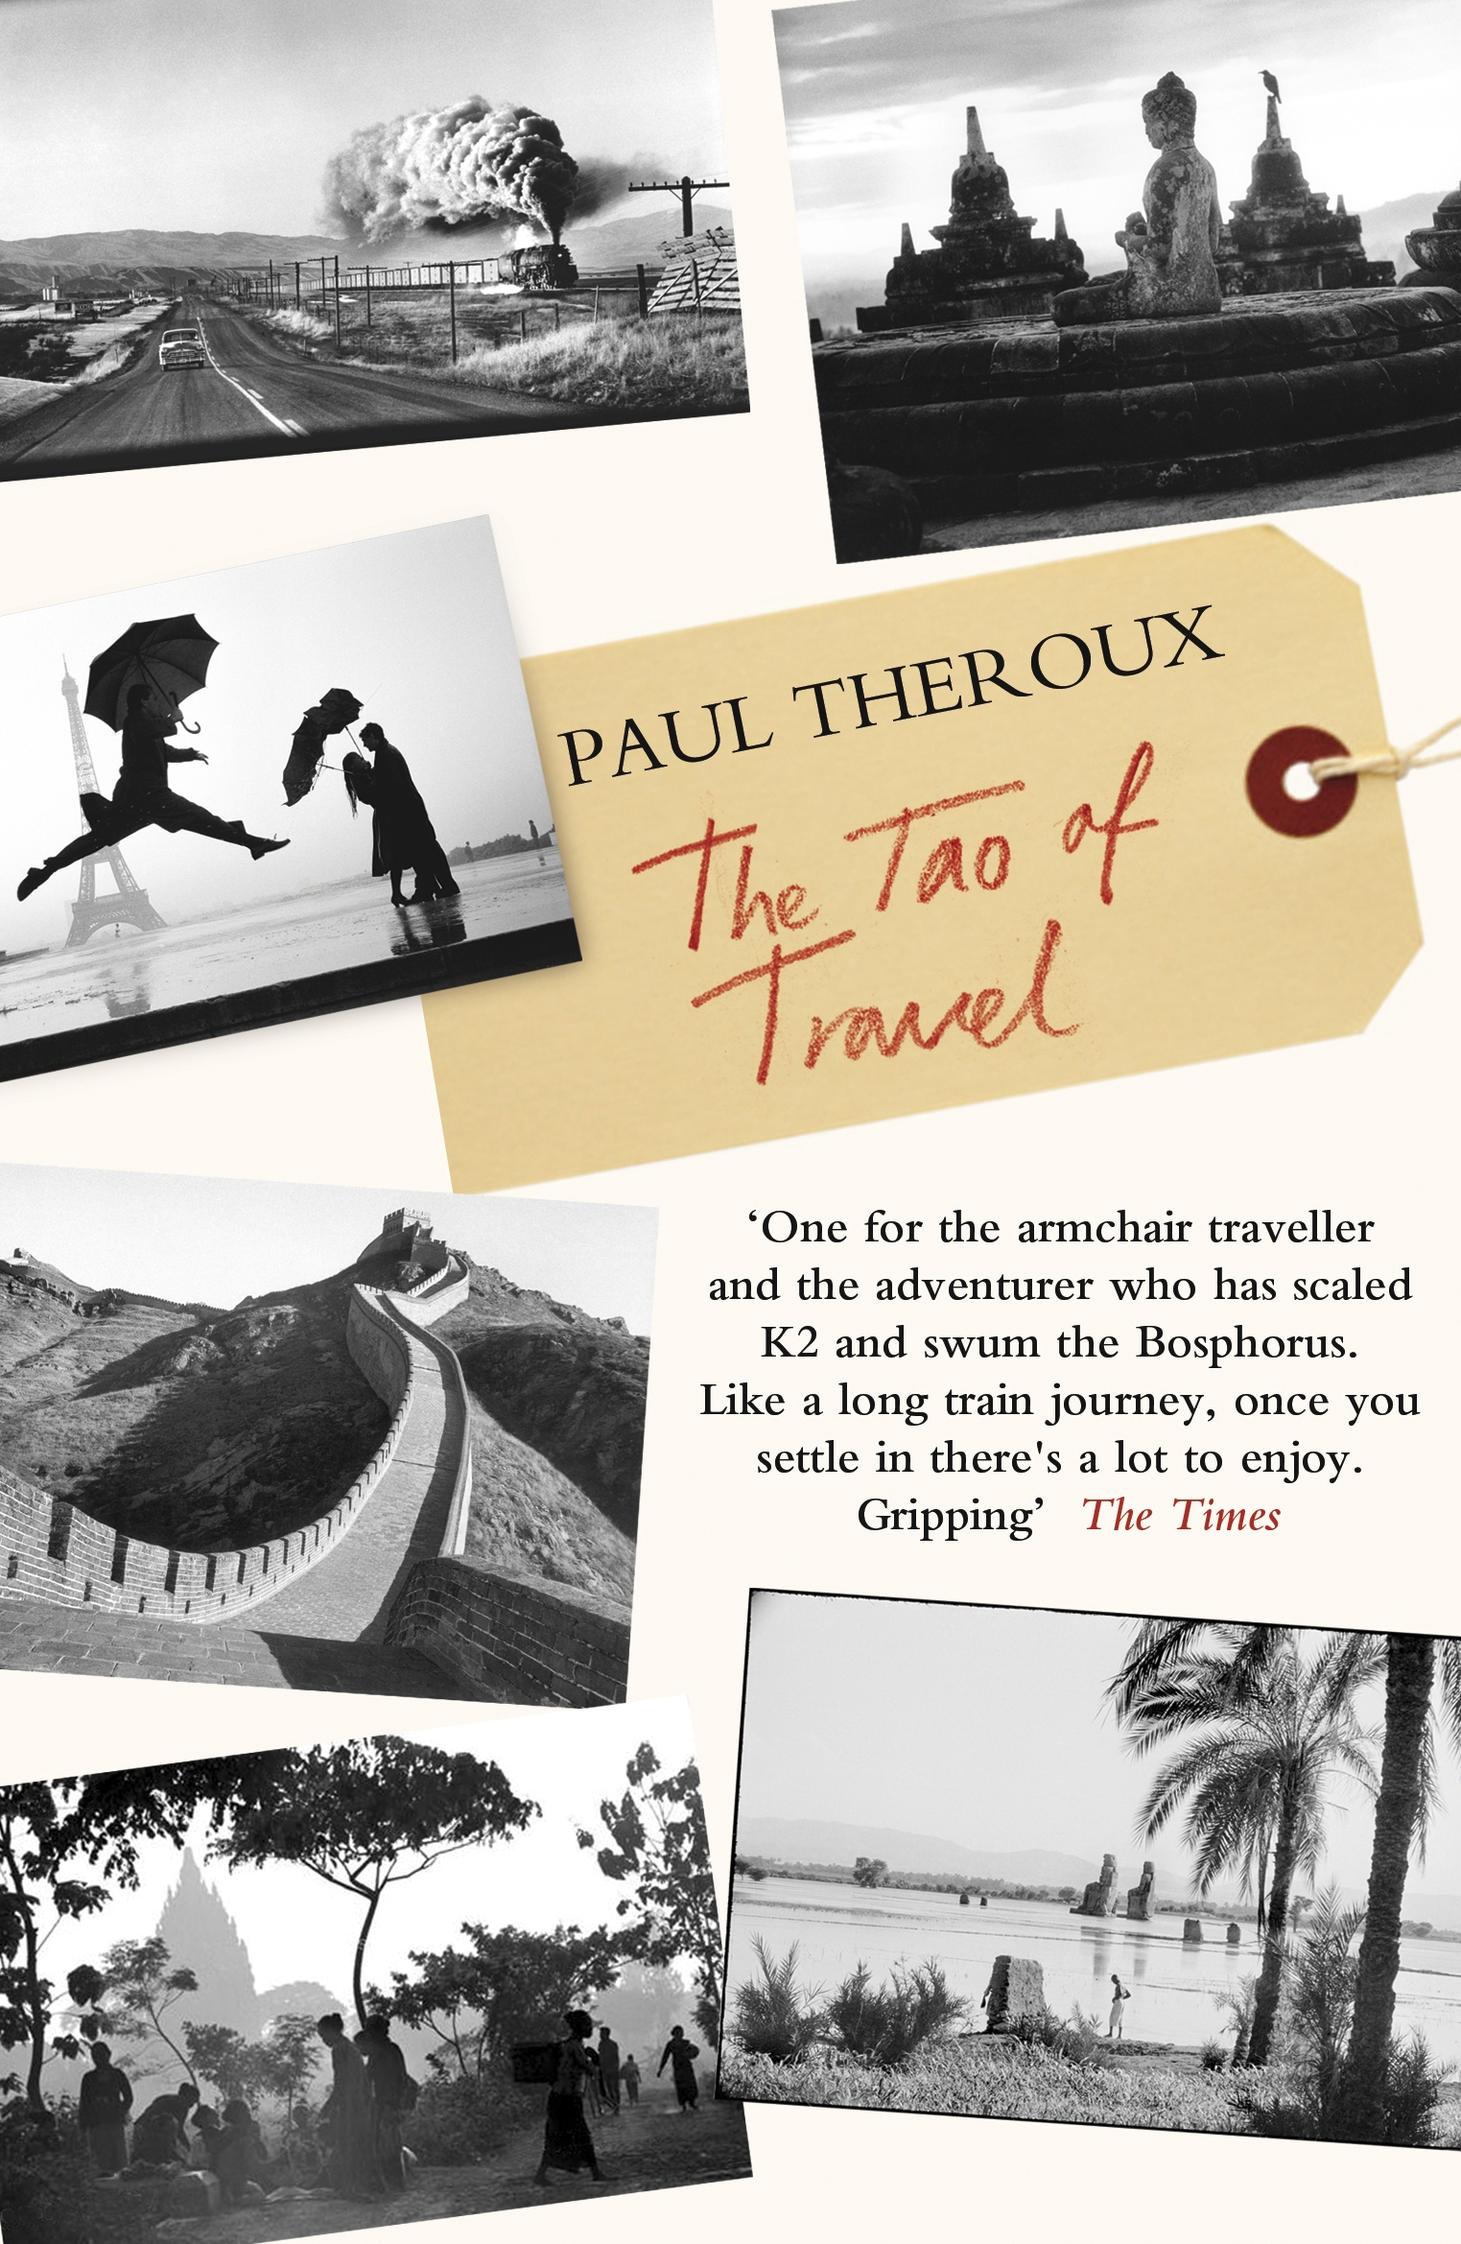 Reisverhaal The Tao of Travel | Paul Theroux <br/>€ 15.50 <br/> <a href='https://www.dezwerver.nl/reisgidsen/?tt=1554_252853_241358_&r=https%3A%2F%2Fwww.dezwerver.nl%2Fr%2Fwereld%2Fc%2Fboeken%2Freisverhalen%2F9780141044262%2Freisverhaal-the-tao-of-travel-paul-theroux%2F' target='_blank'>Meer Info</a>